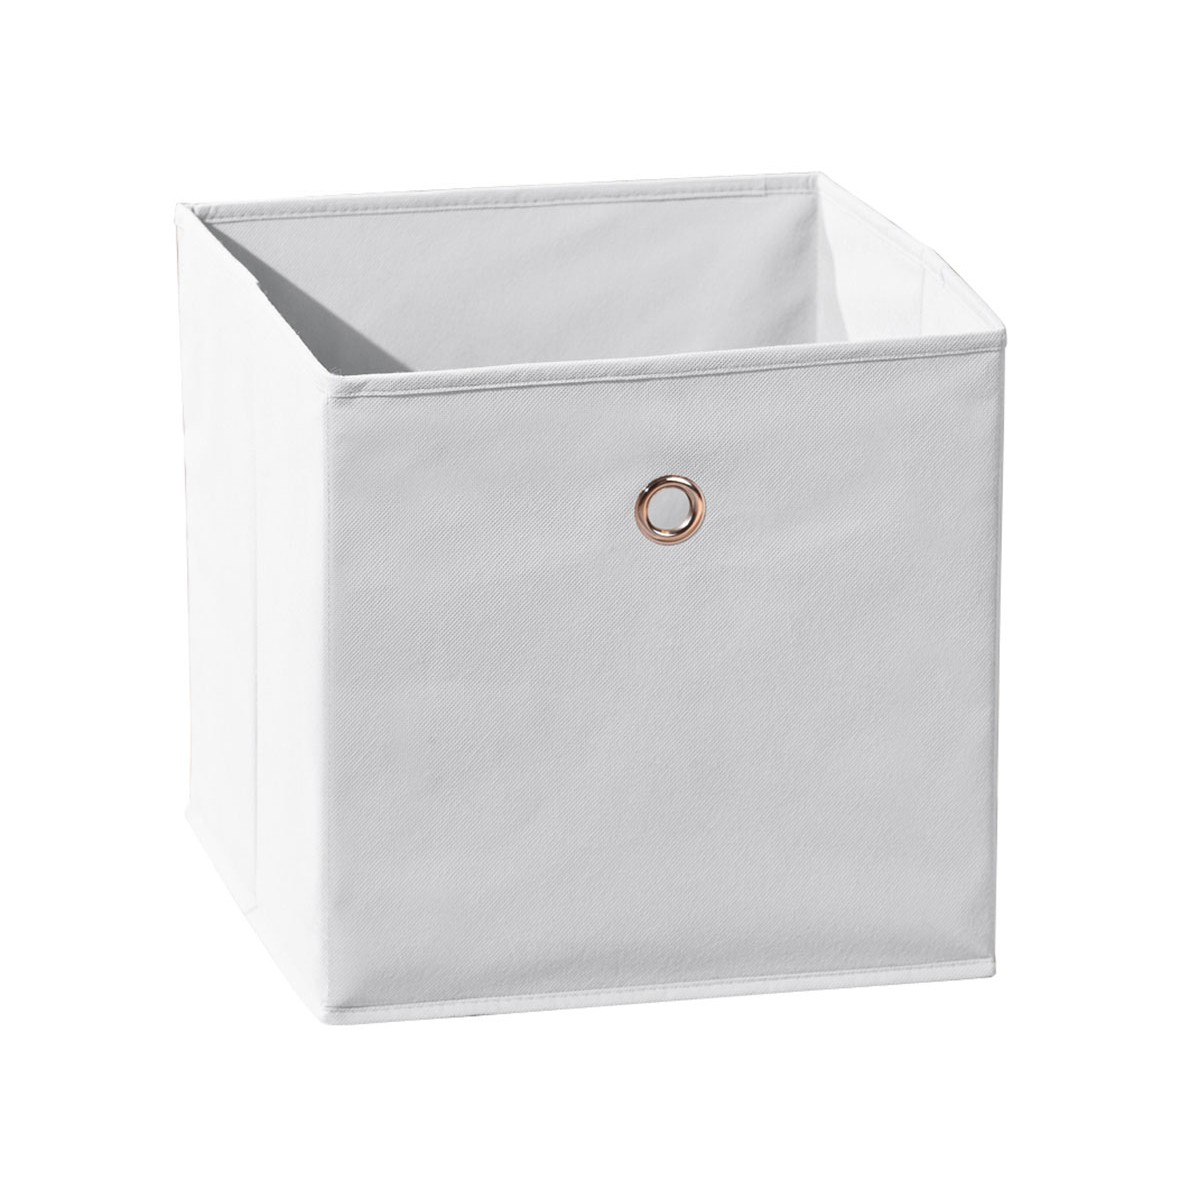 altobuy squareboxx bac de rangement blanc neuf ebay. Black Bedroom Furniture Sets. Home Design Ideas